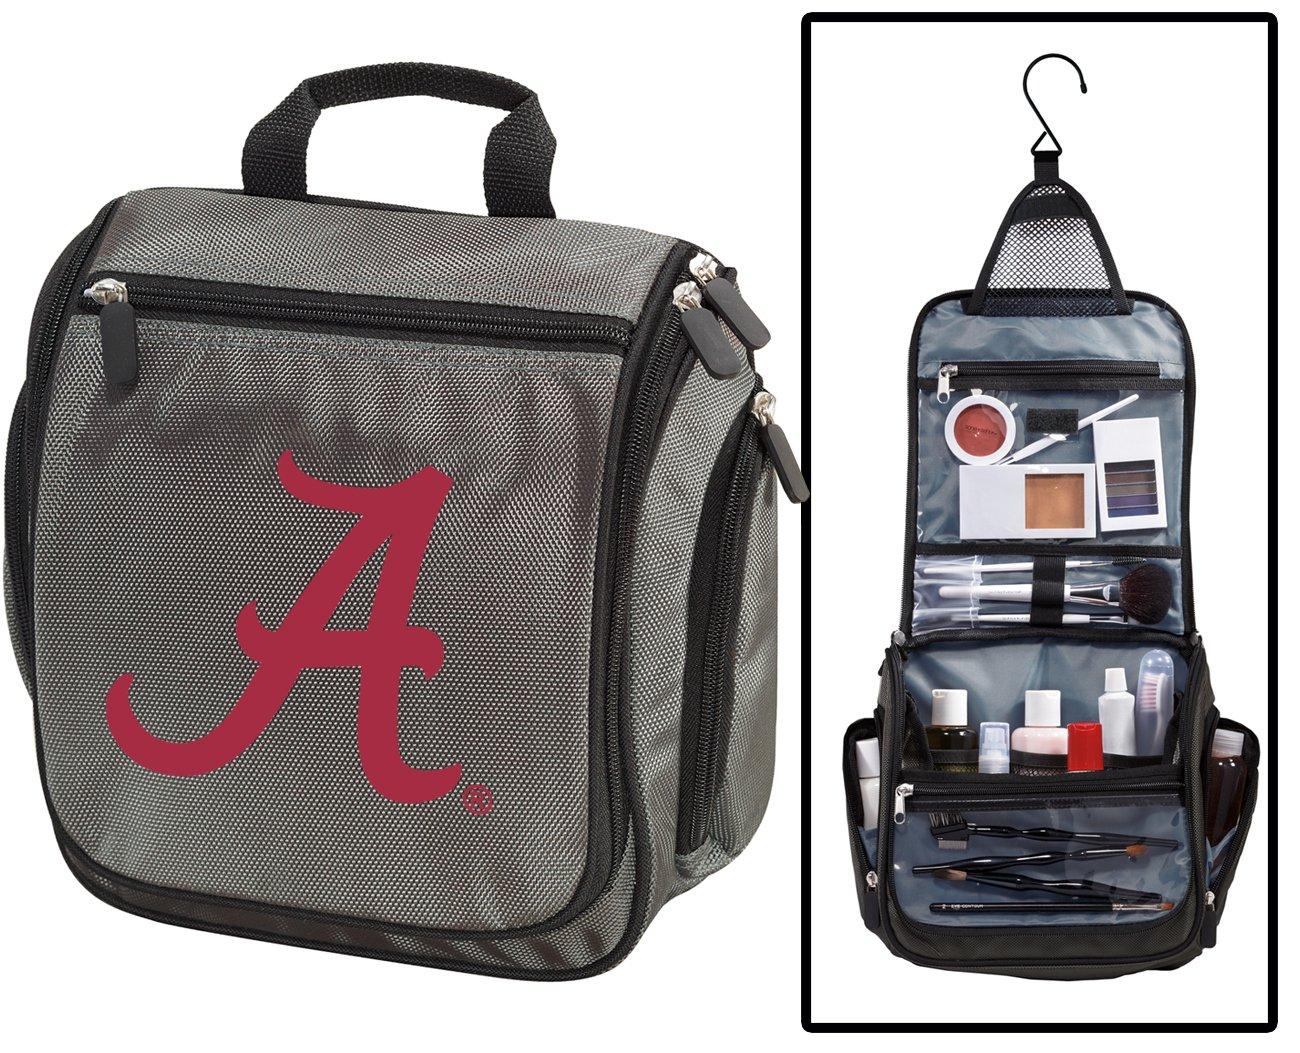 University of Alabama Toiletry Bags or Mens Shaving Kits HANGABLE Travel Bag